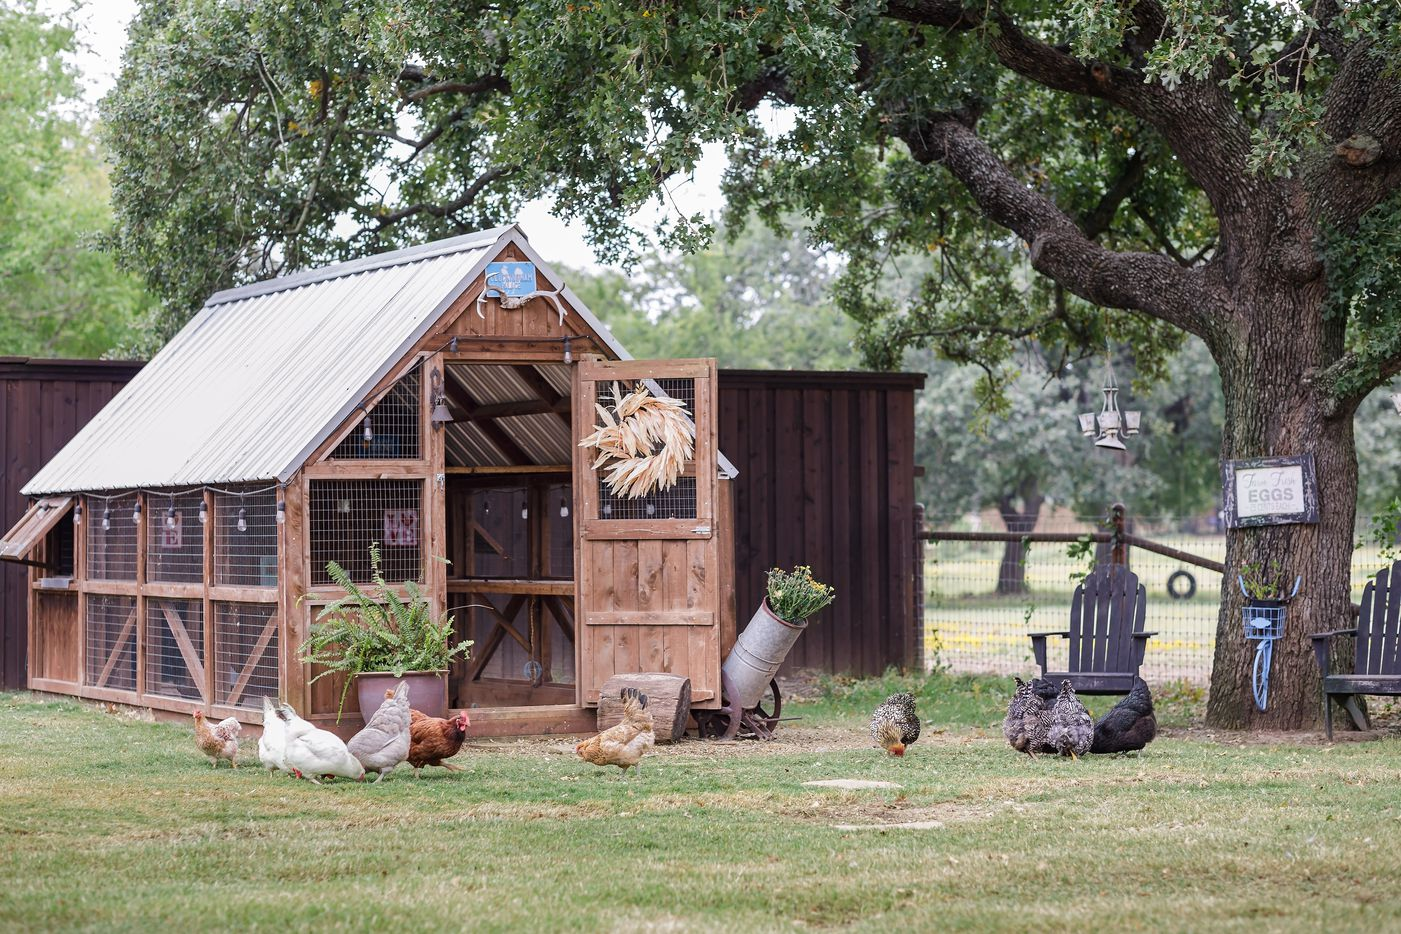 Take a look at 4004 Quail Run Road in Flower Mound, Texas.